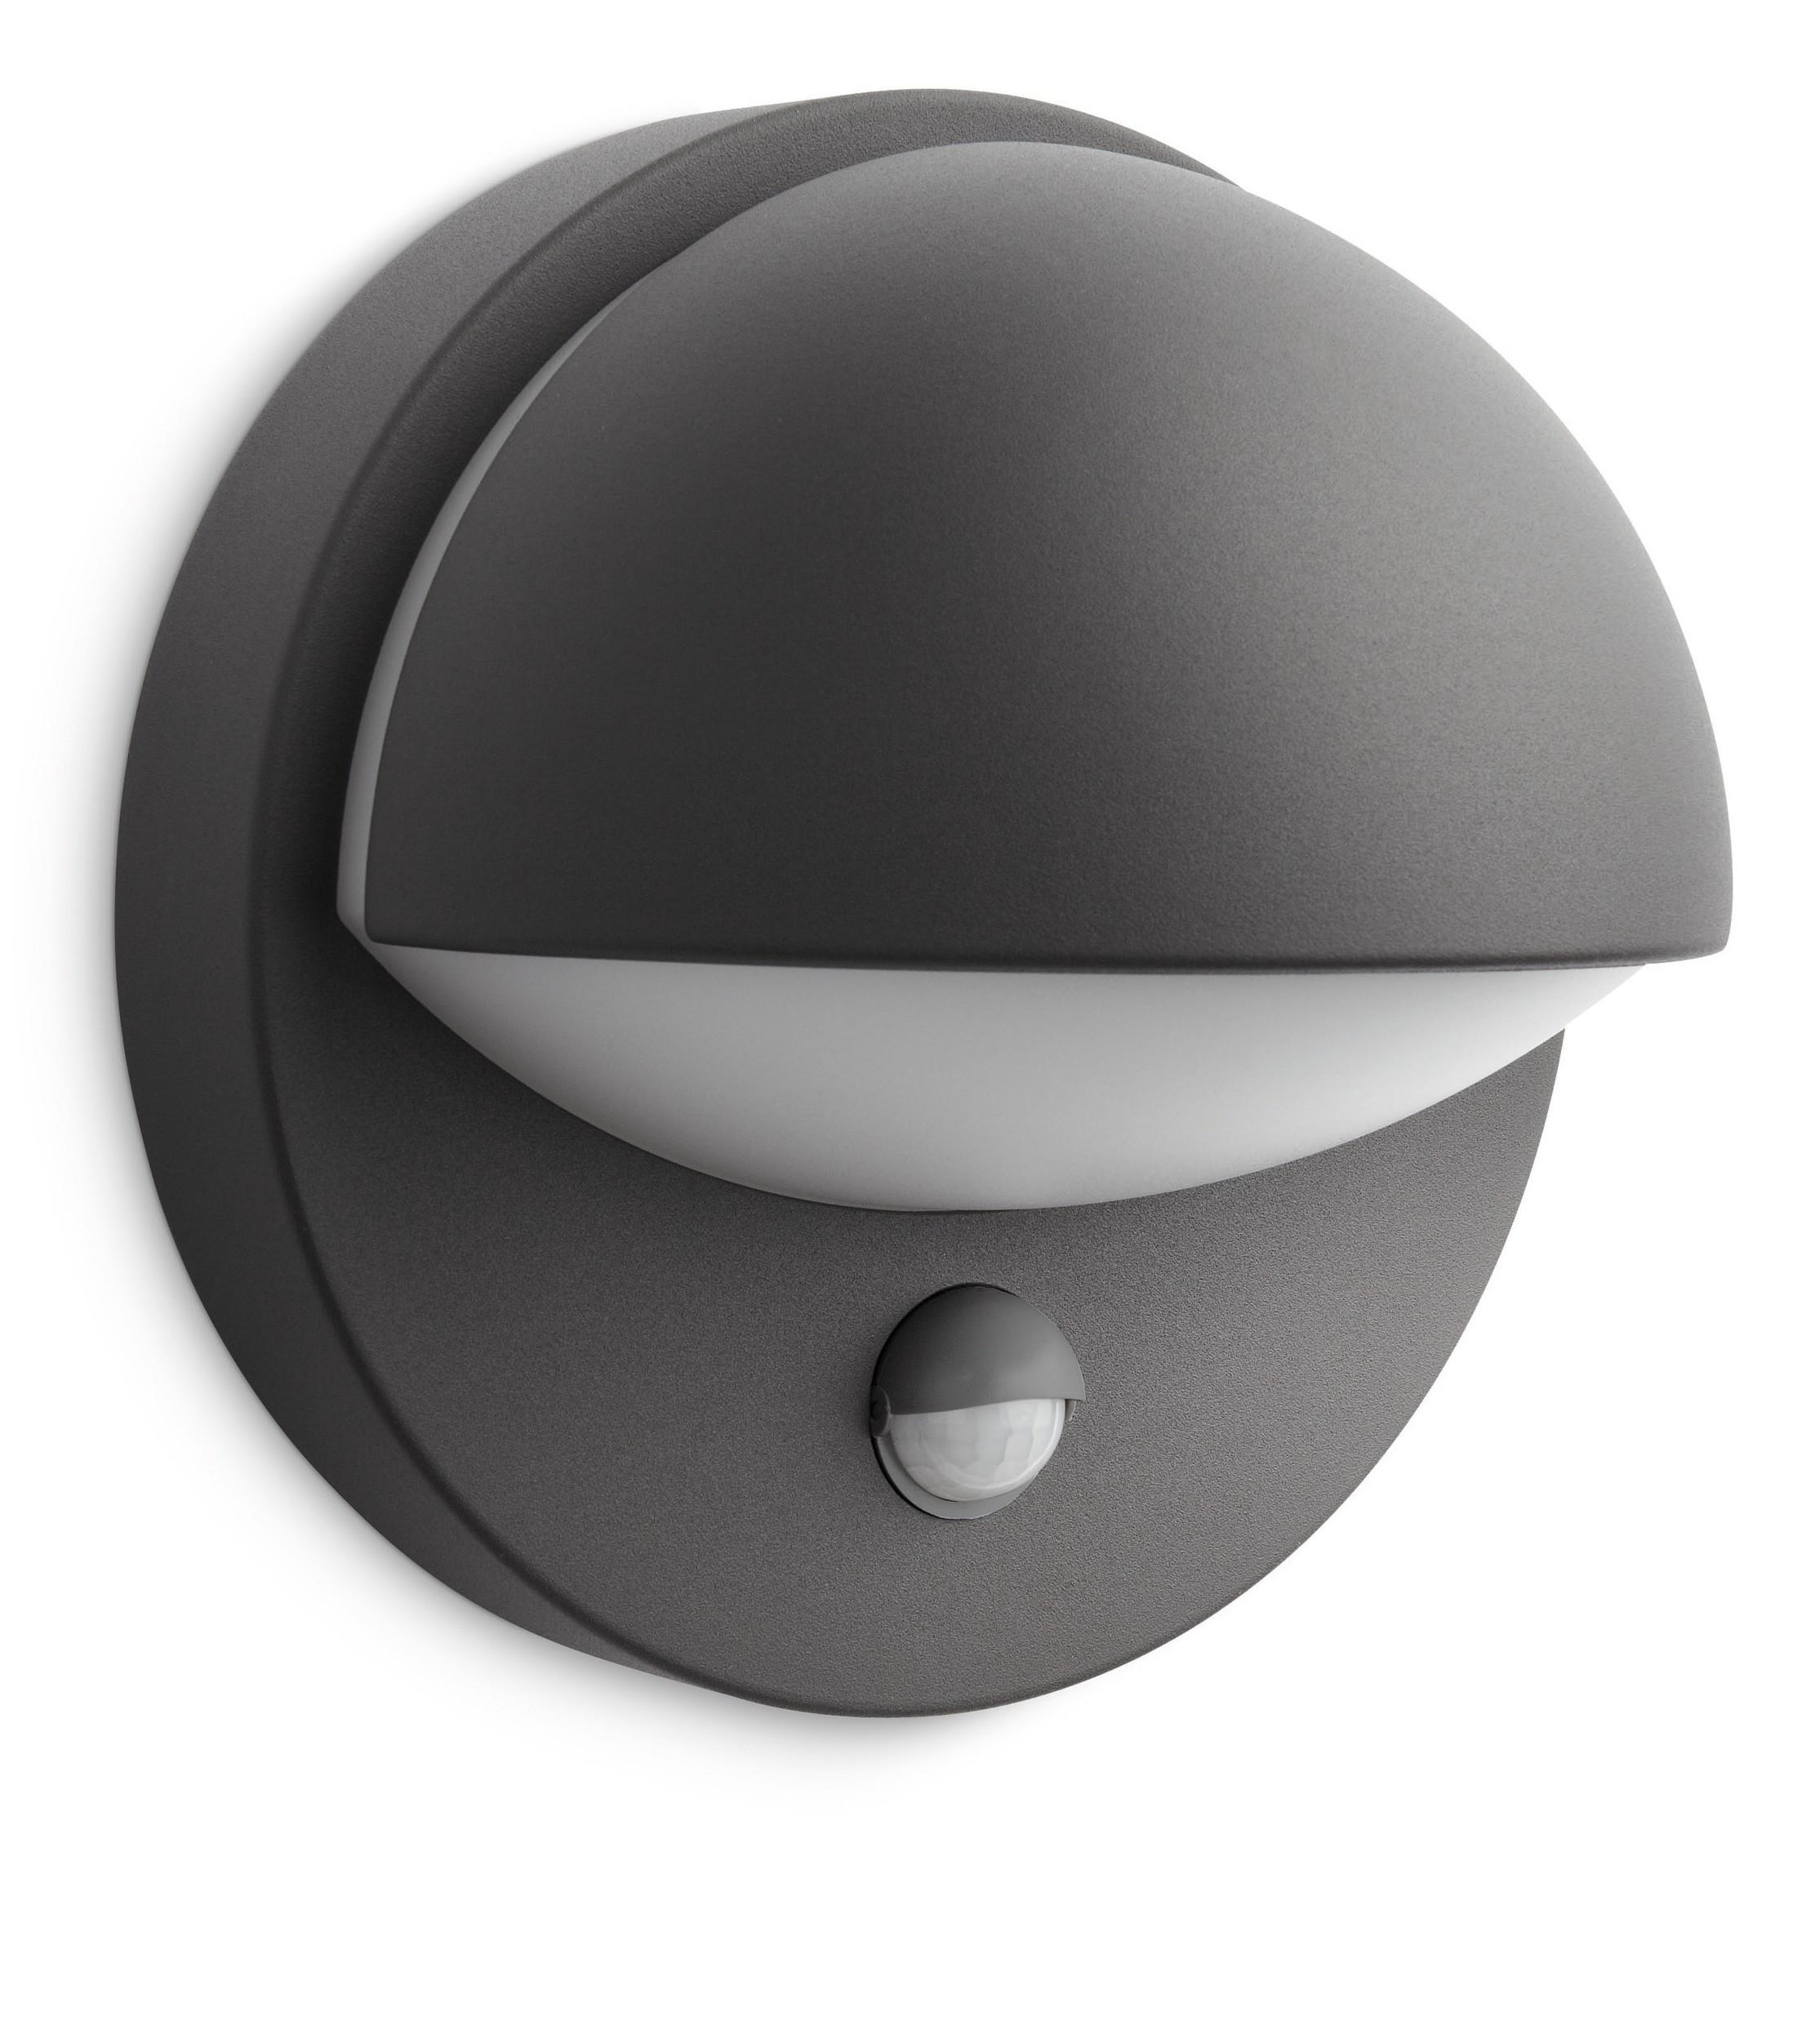 philips june 162469316 antraciet sensor wandlamp. Black Bedroom Furniture Sets. Home Design Ideas